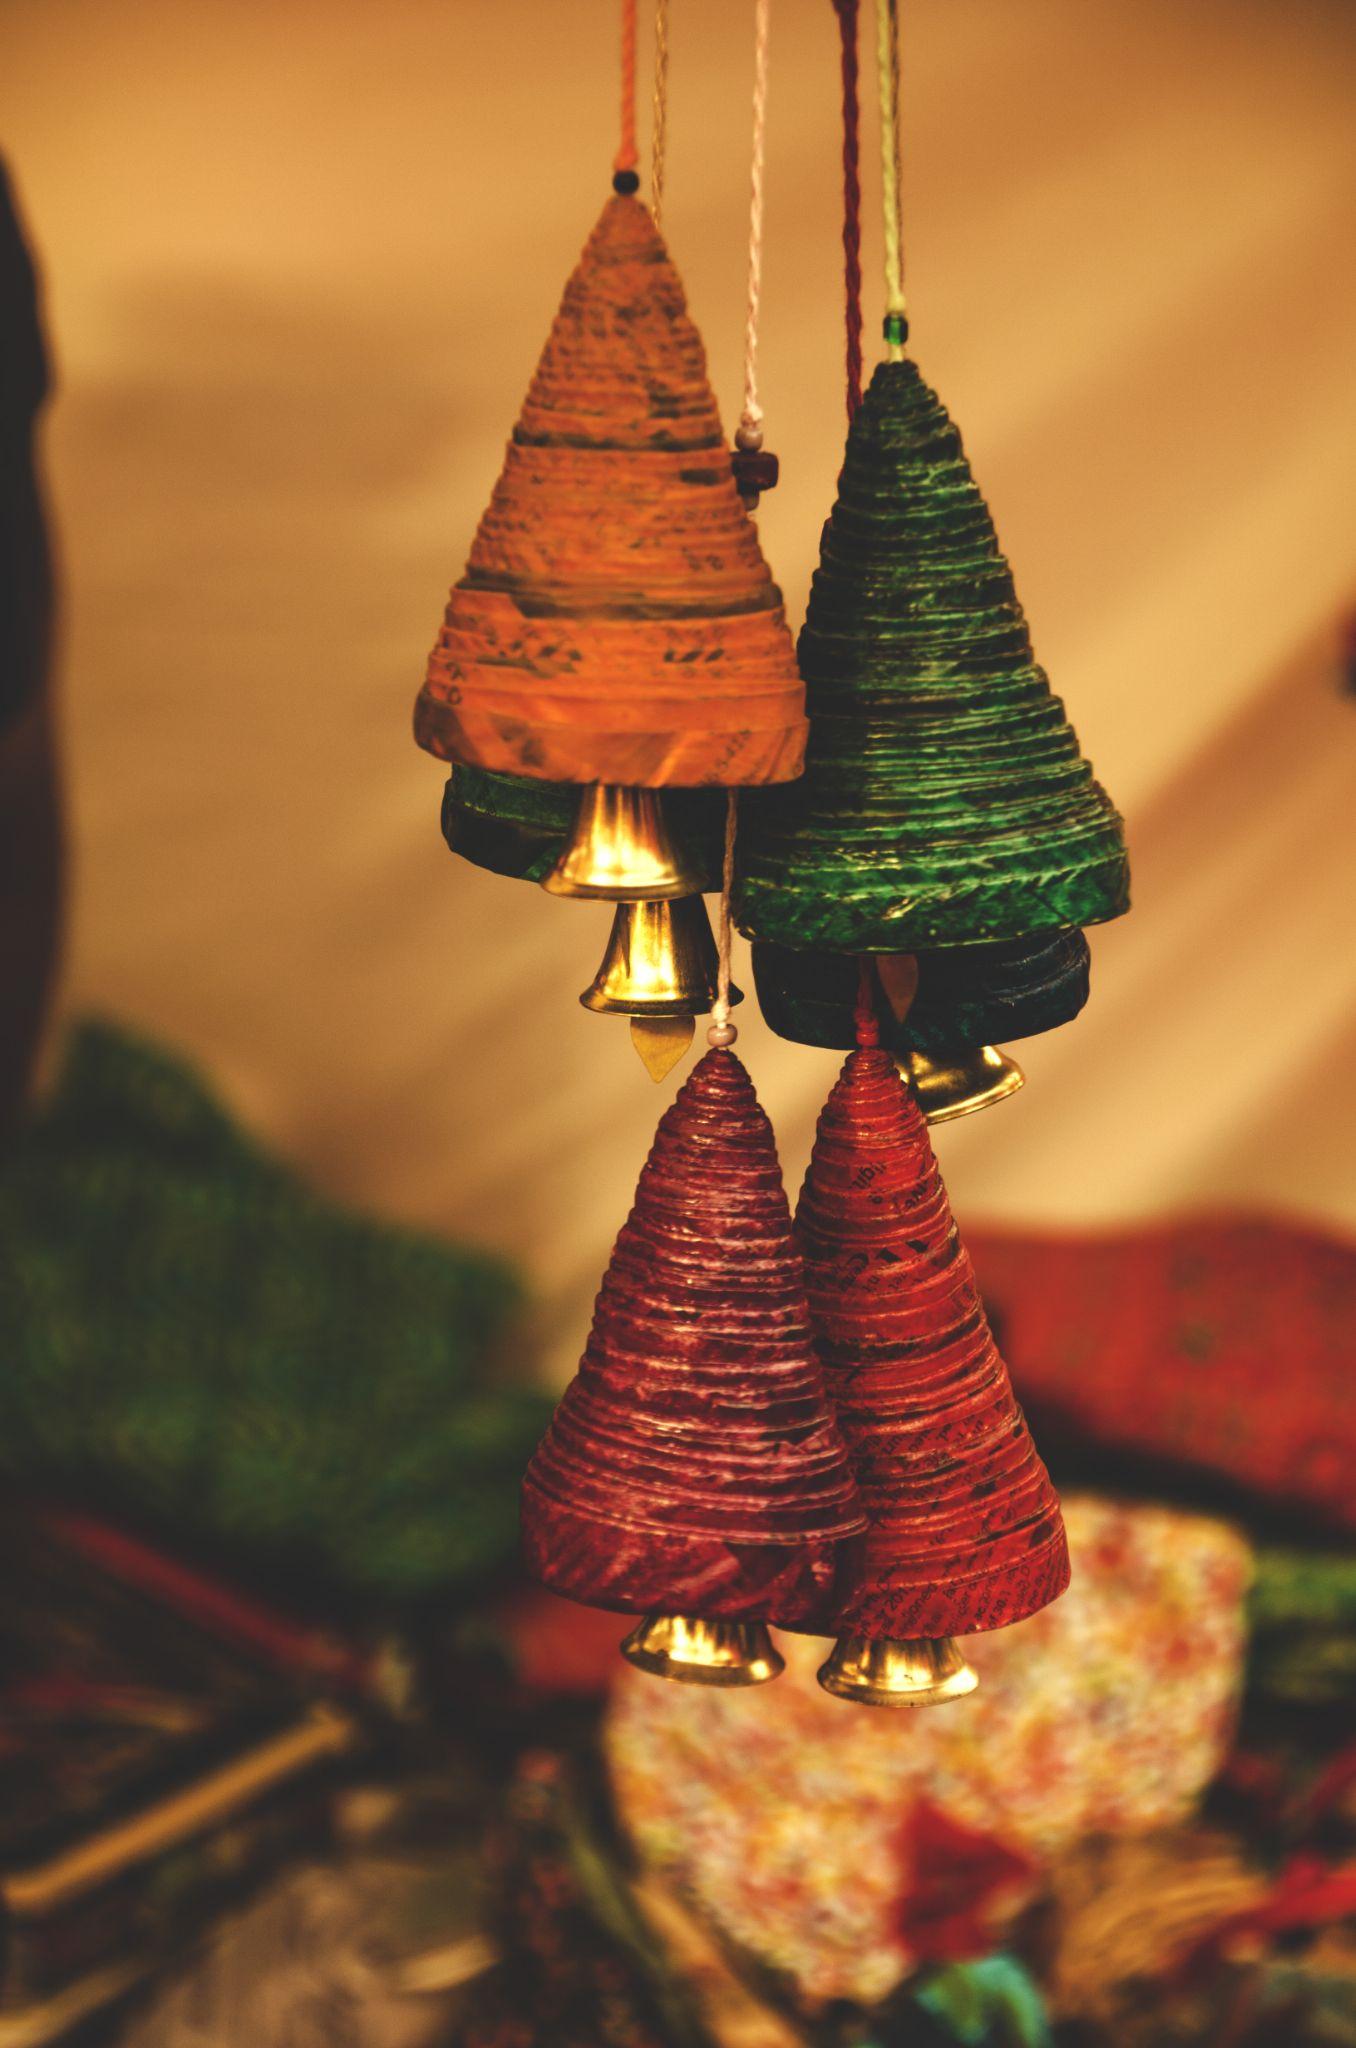 Color Threads by Arindam Bhattacharjee